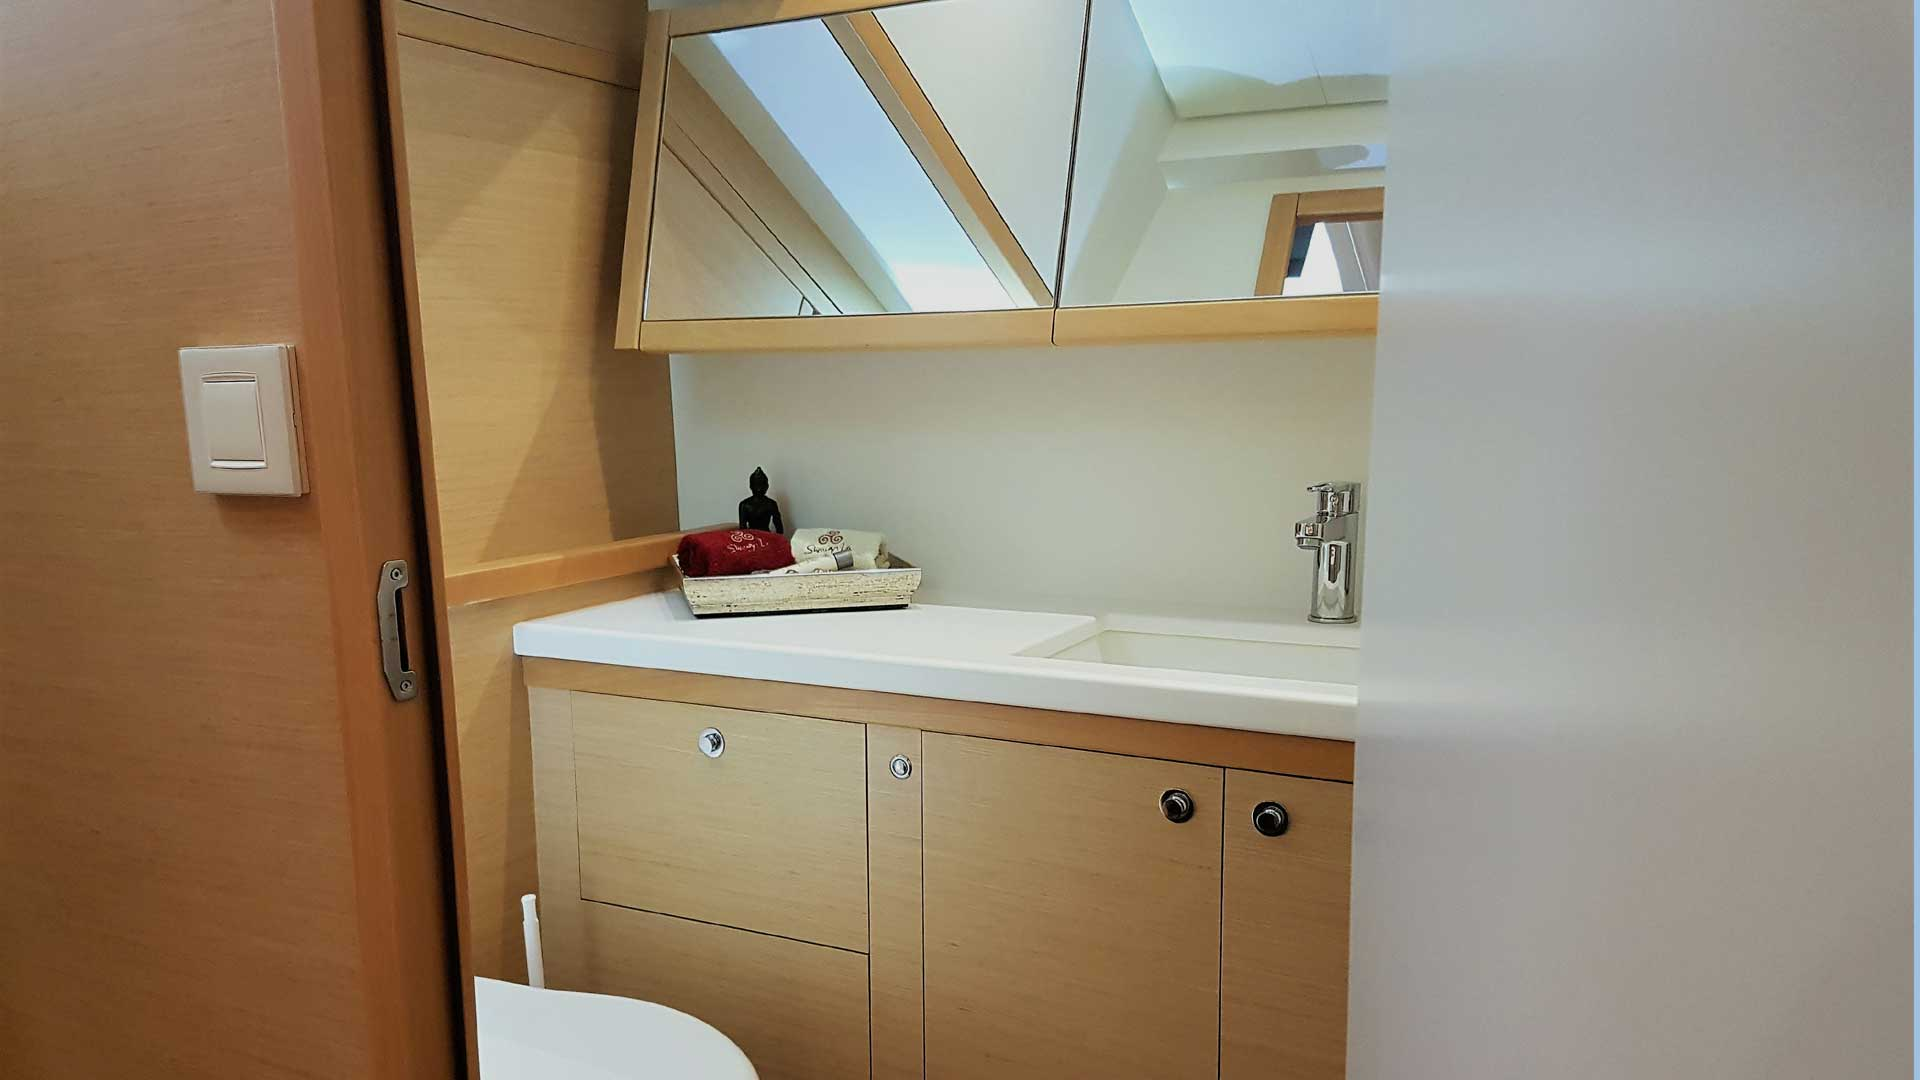 Master Bedroom Bathroom and Shower on Crewed Charter Catamaran